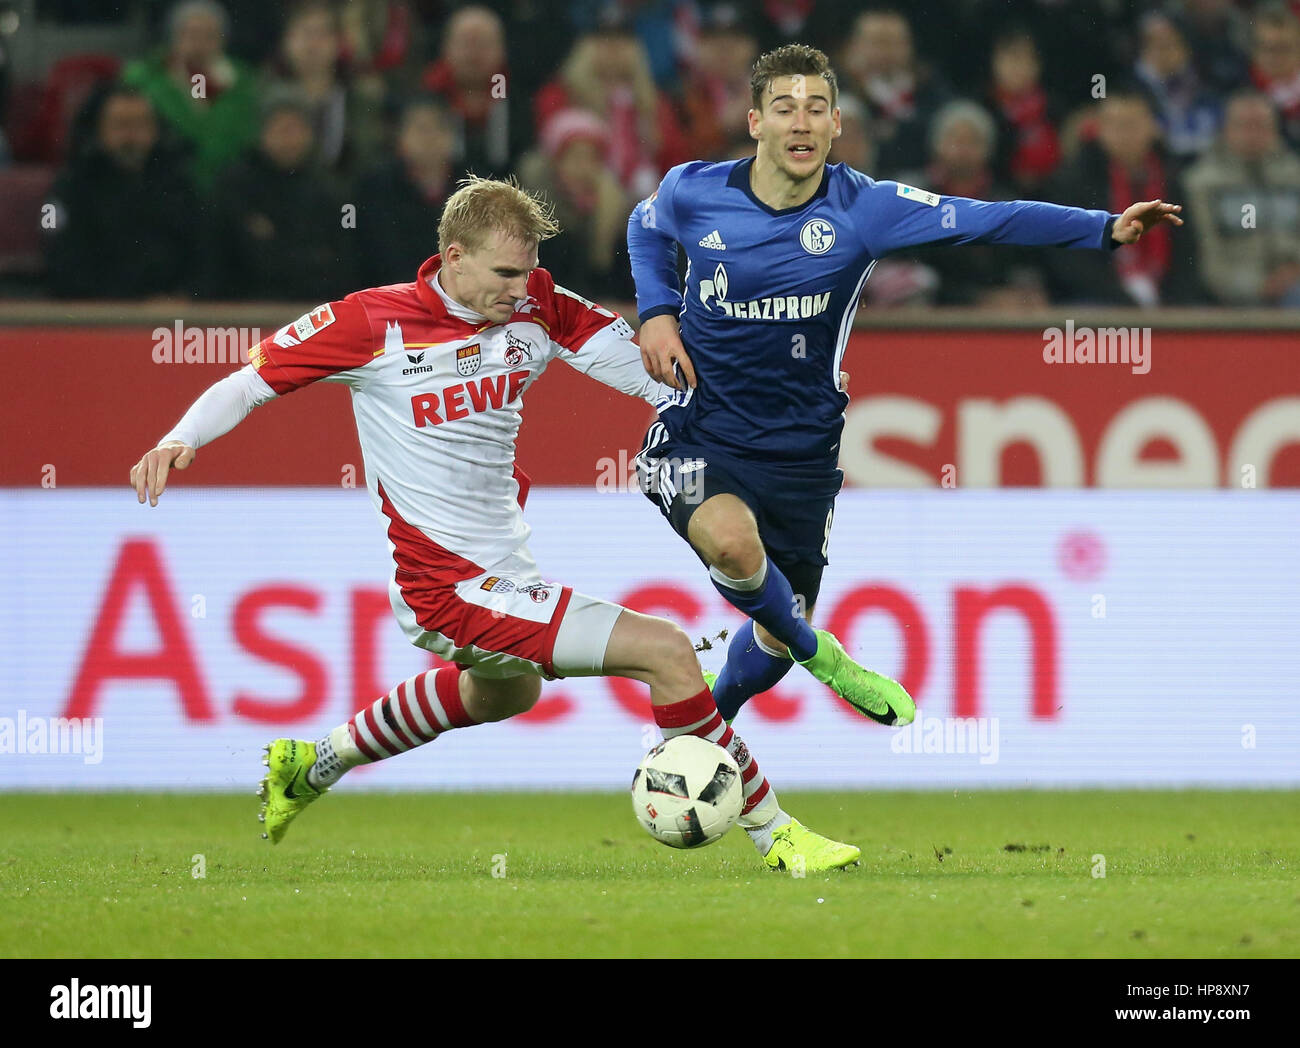 Cologne, Germany, February 19, 2017, Bundesliga matchday 21, 1. FC Koeln - FC Schalke 04:  Tackling Frederik Soerensen - Stock Image